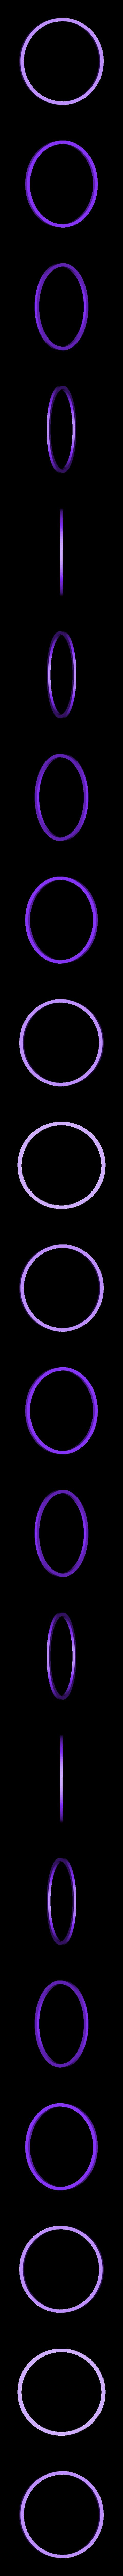 Goggle_Minions_1_eye_strap.stl Download free STL file Minions Goggle Monoeye • 3D printer design, MVSValero